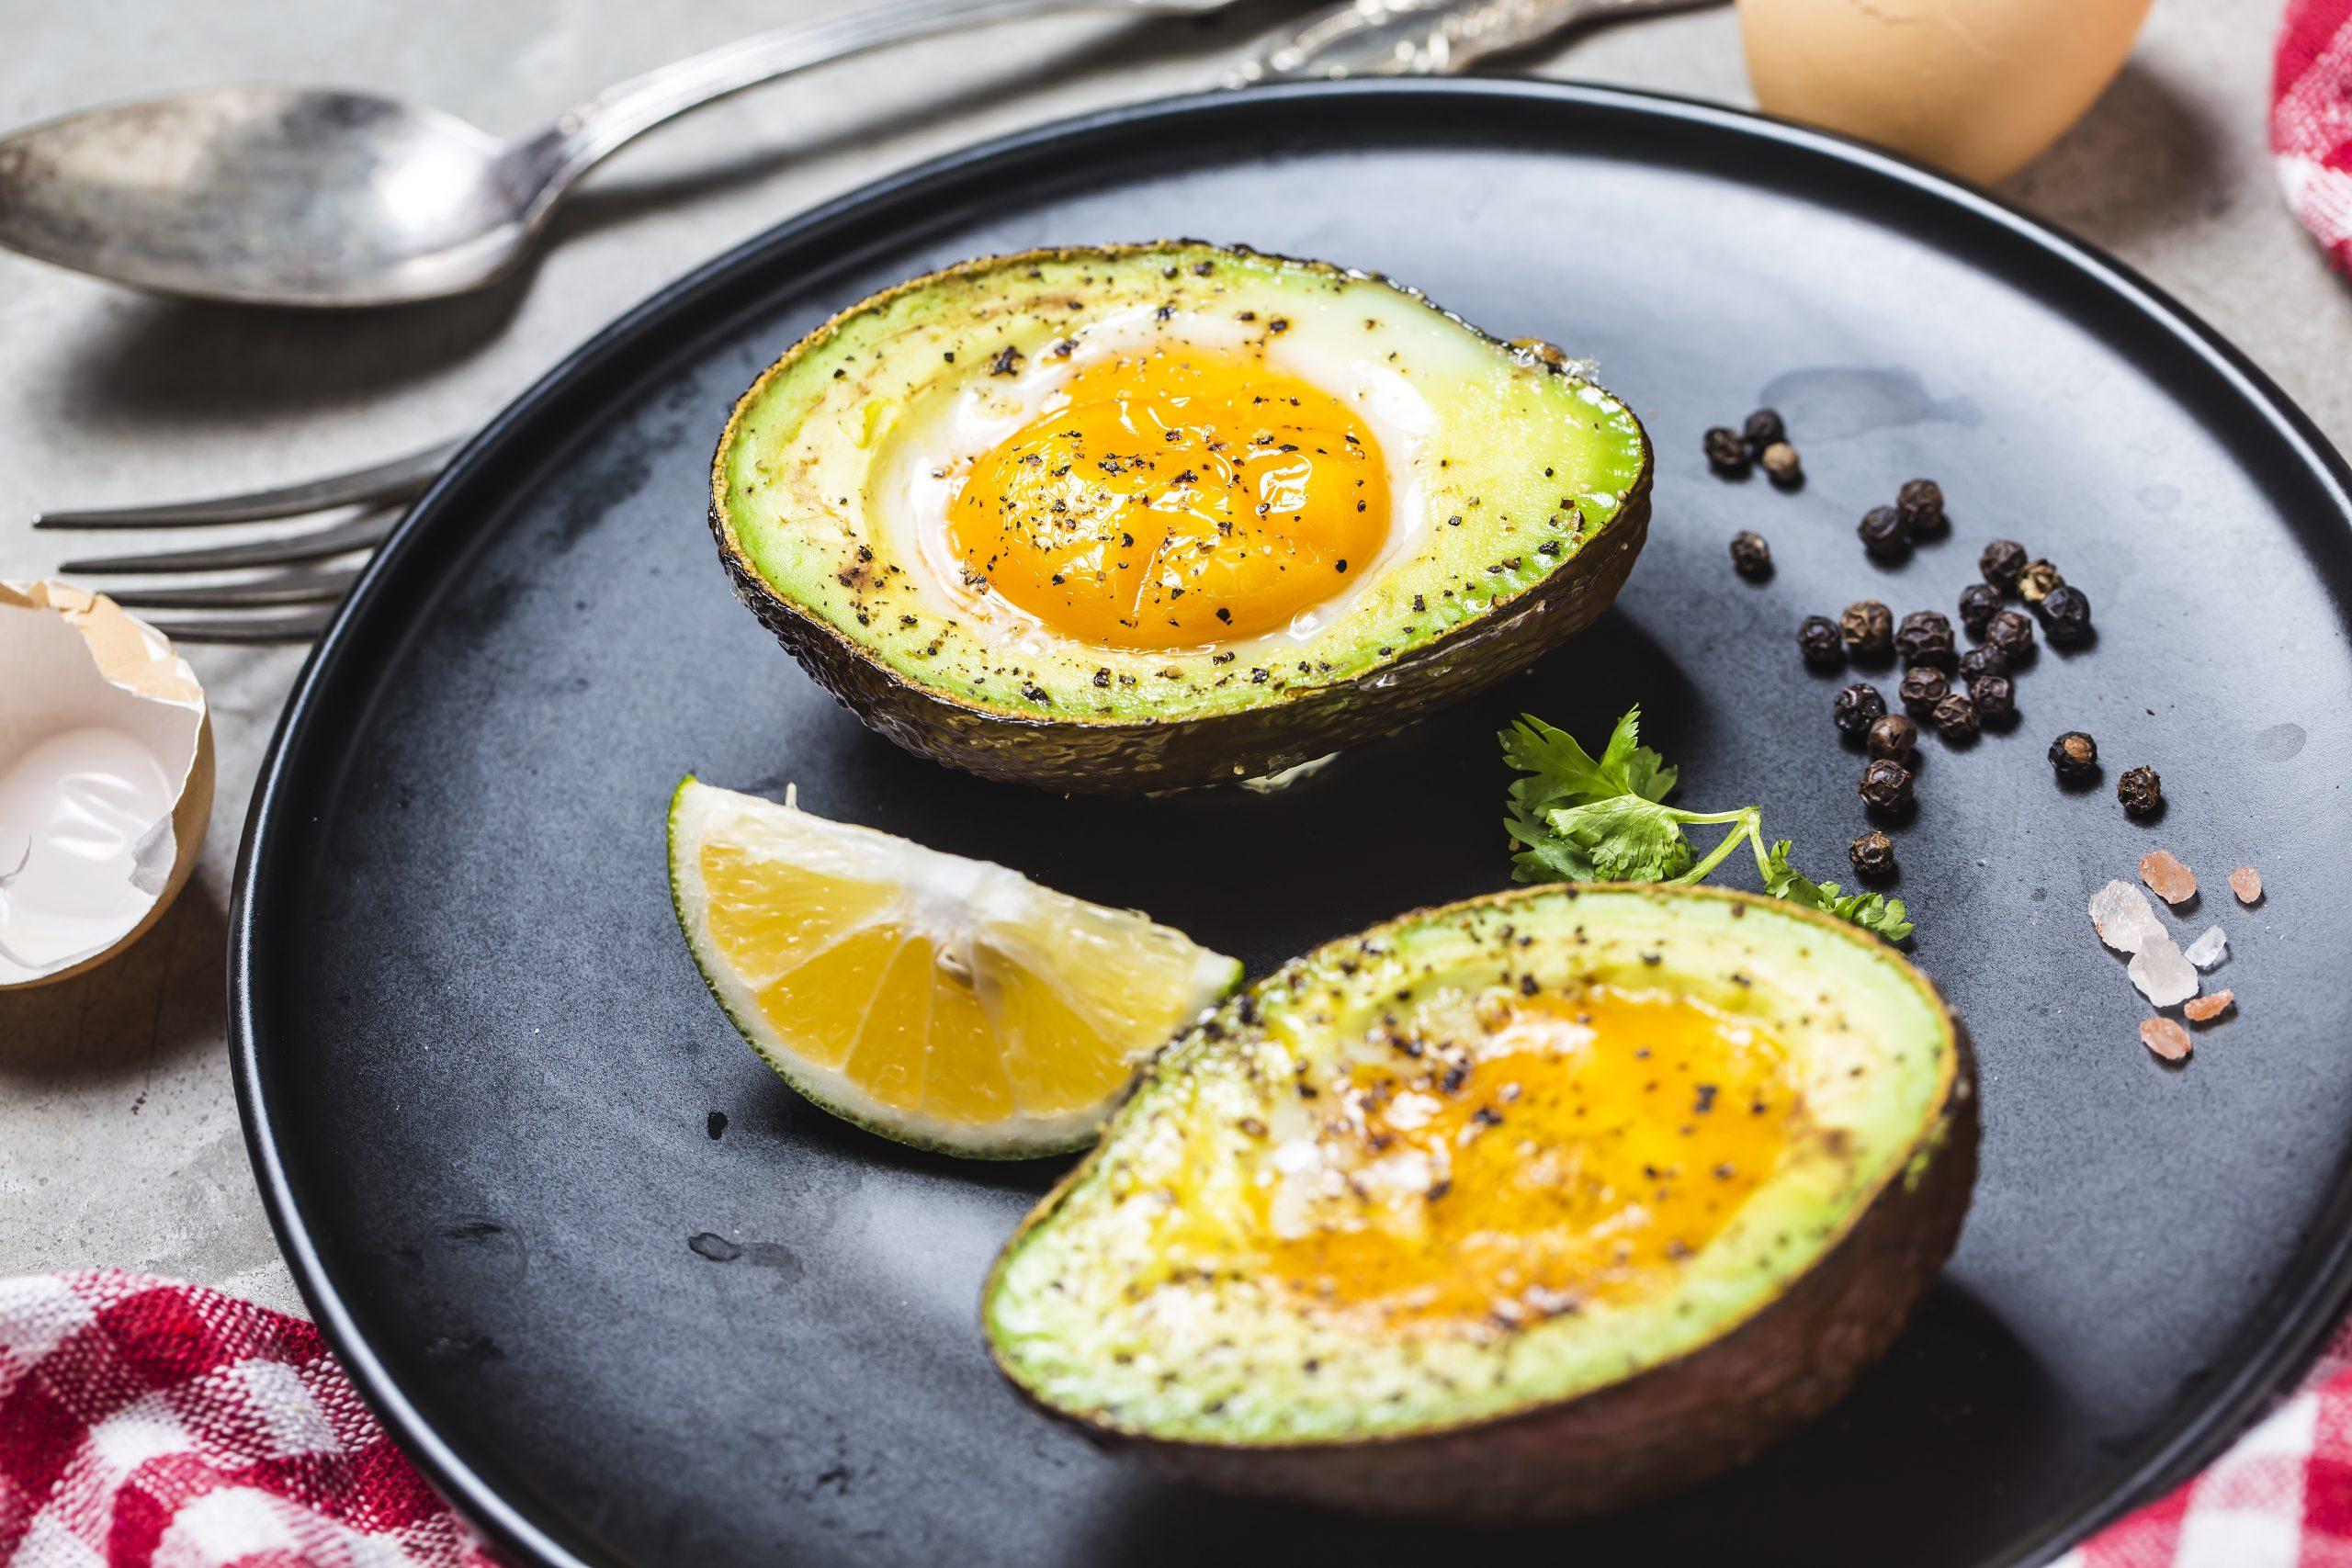 Keto Baked Avocado, Egg & Smoked Salmon